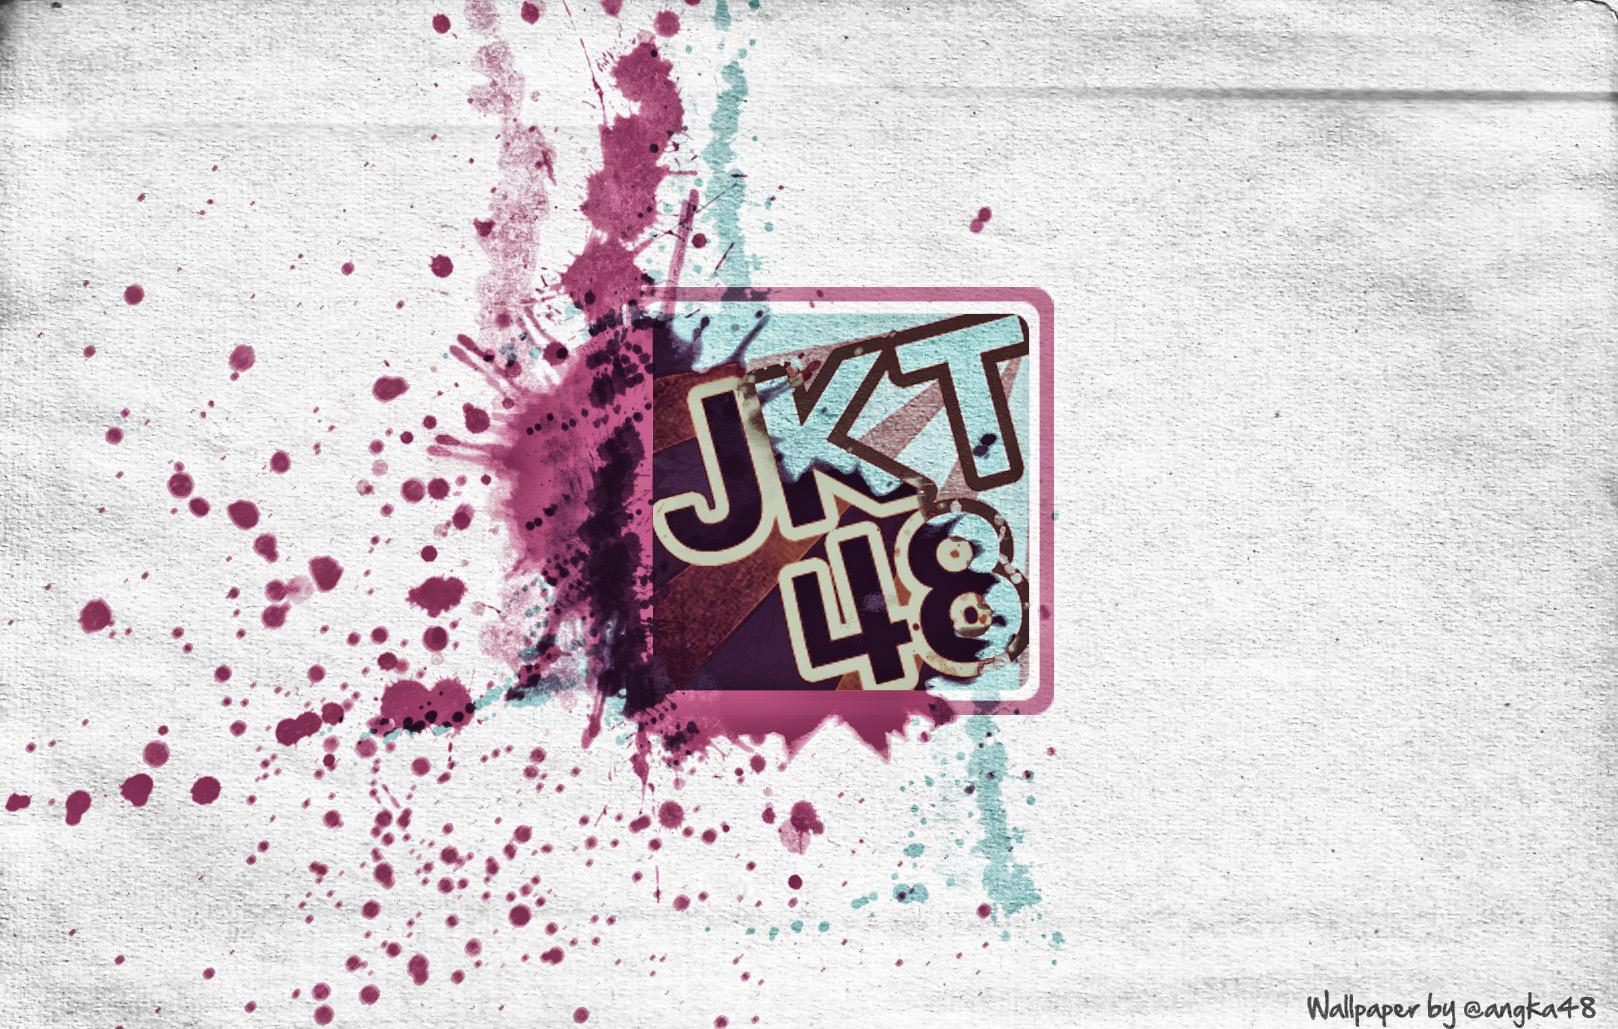 JKT48 Desktop Wallpaper by SaintOfArt 1618x1029